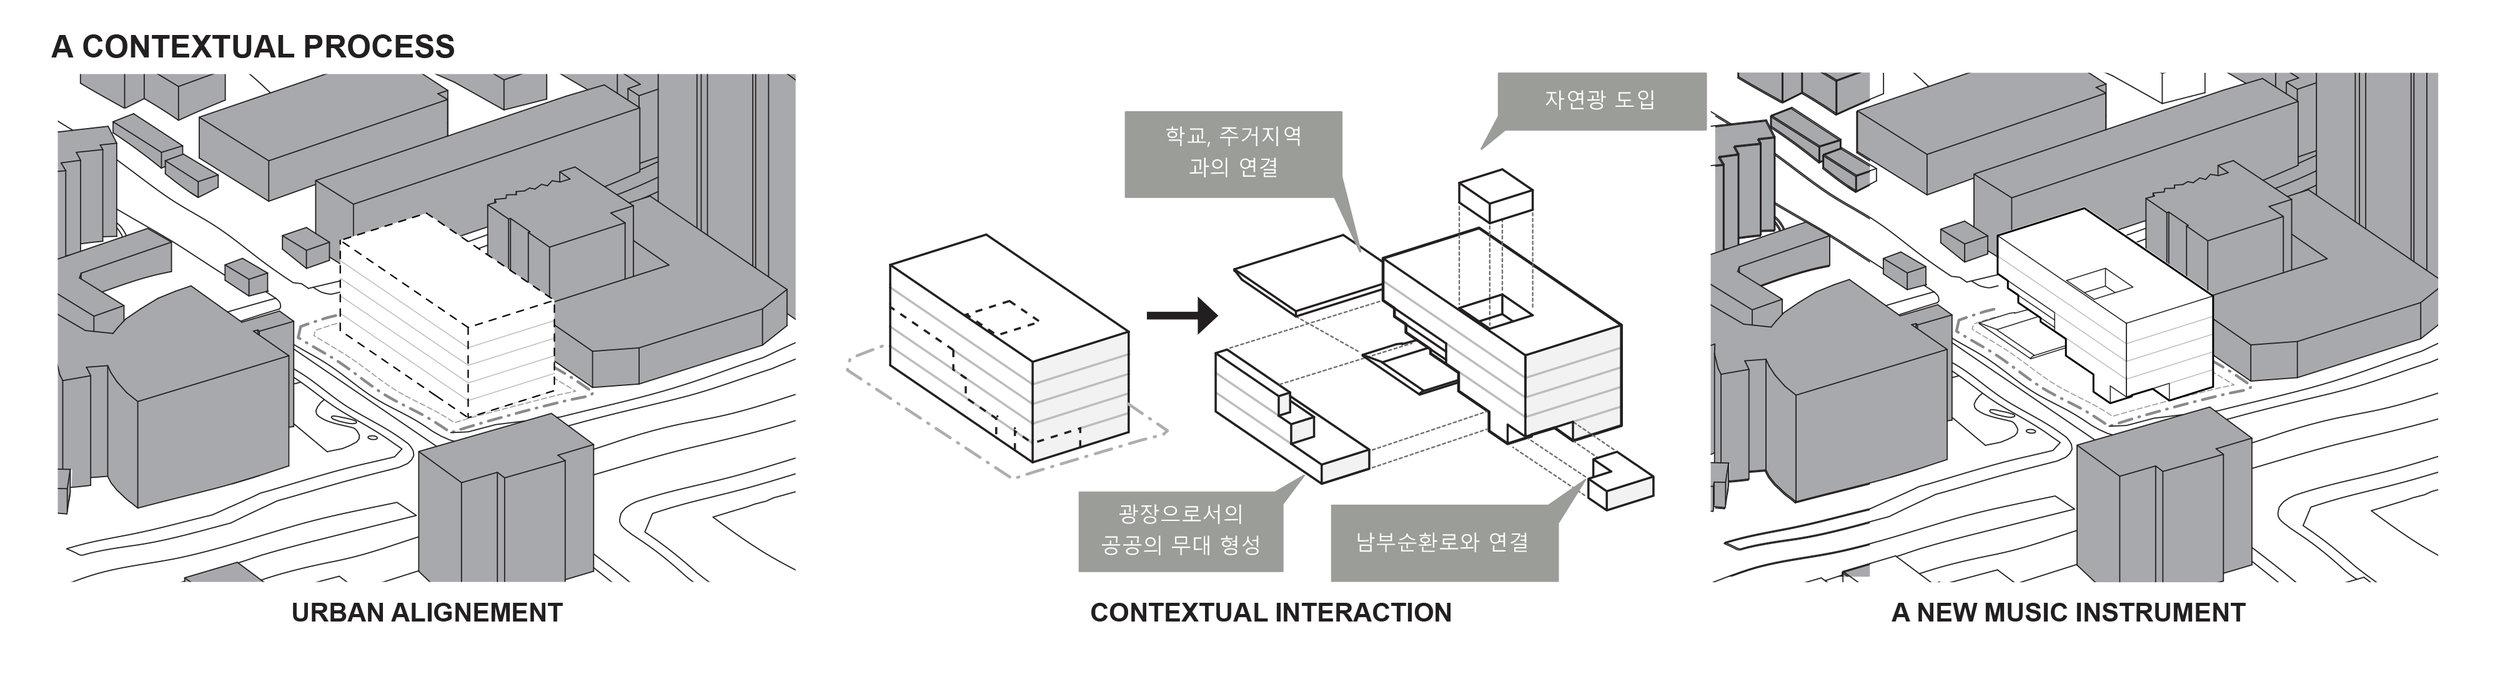 contextual process.jpg